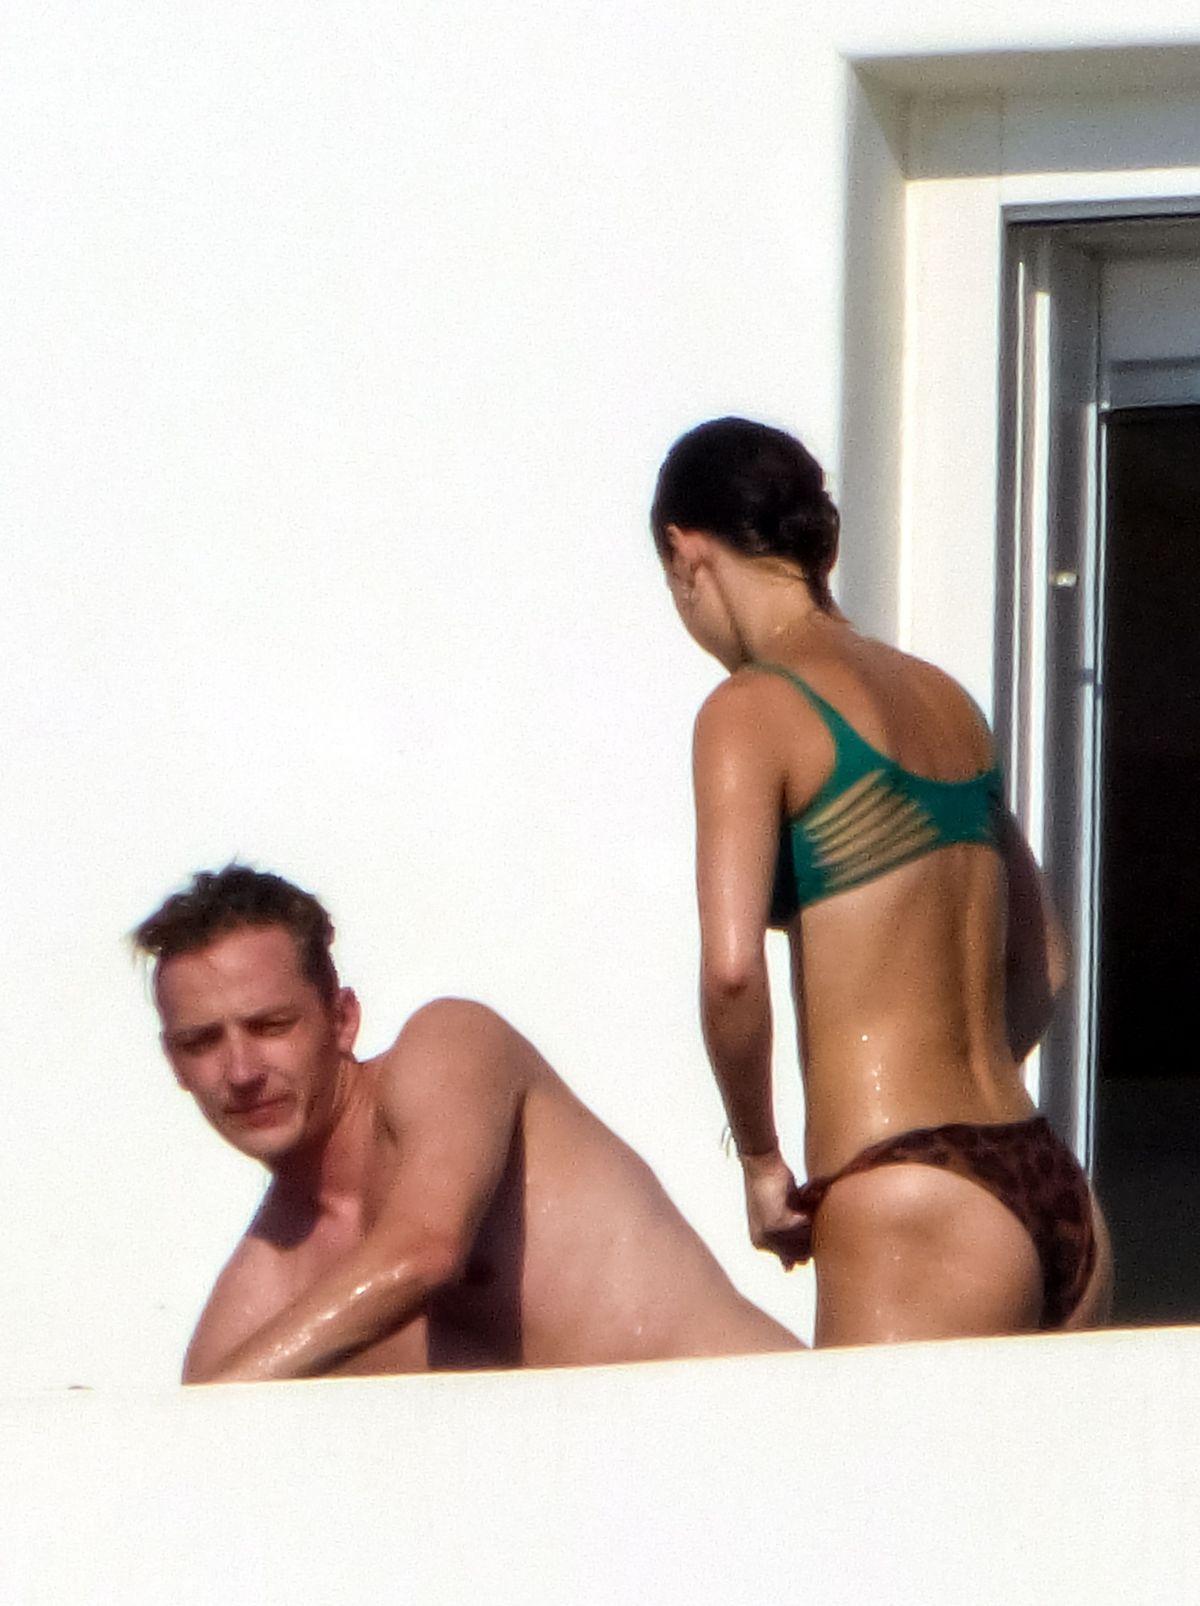 Lena meyer landrut bikini